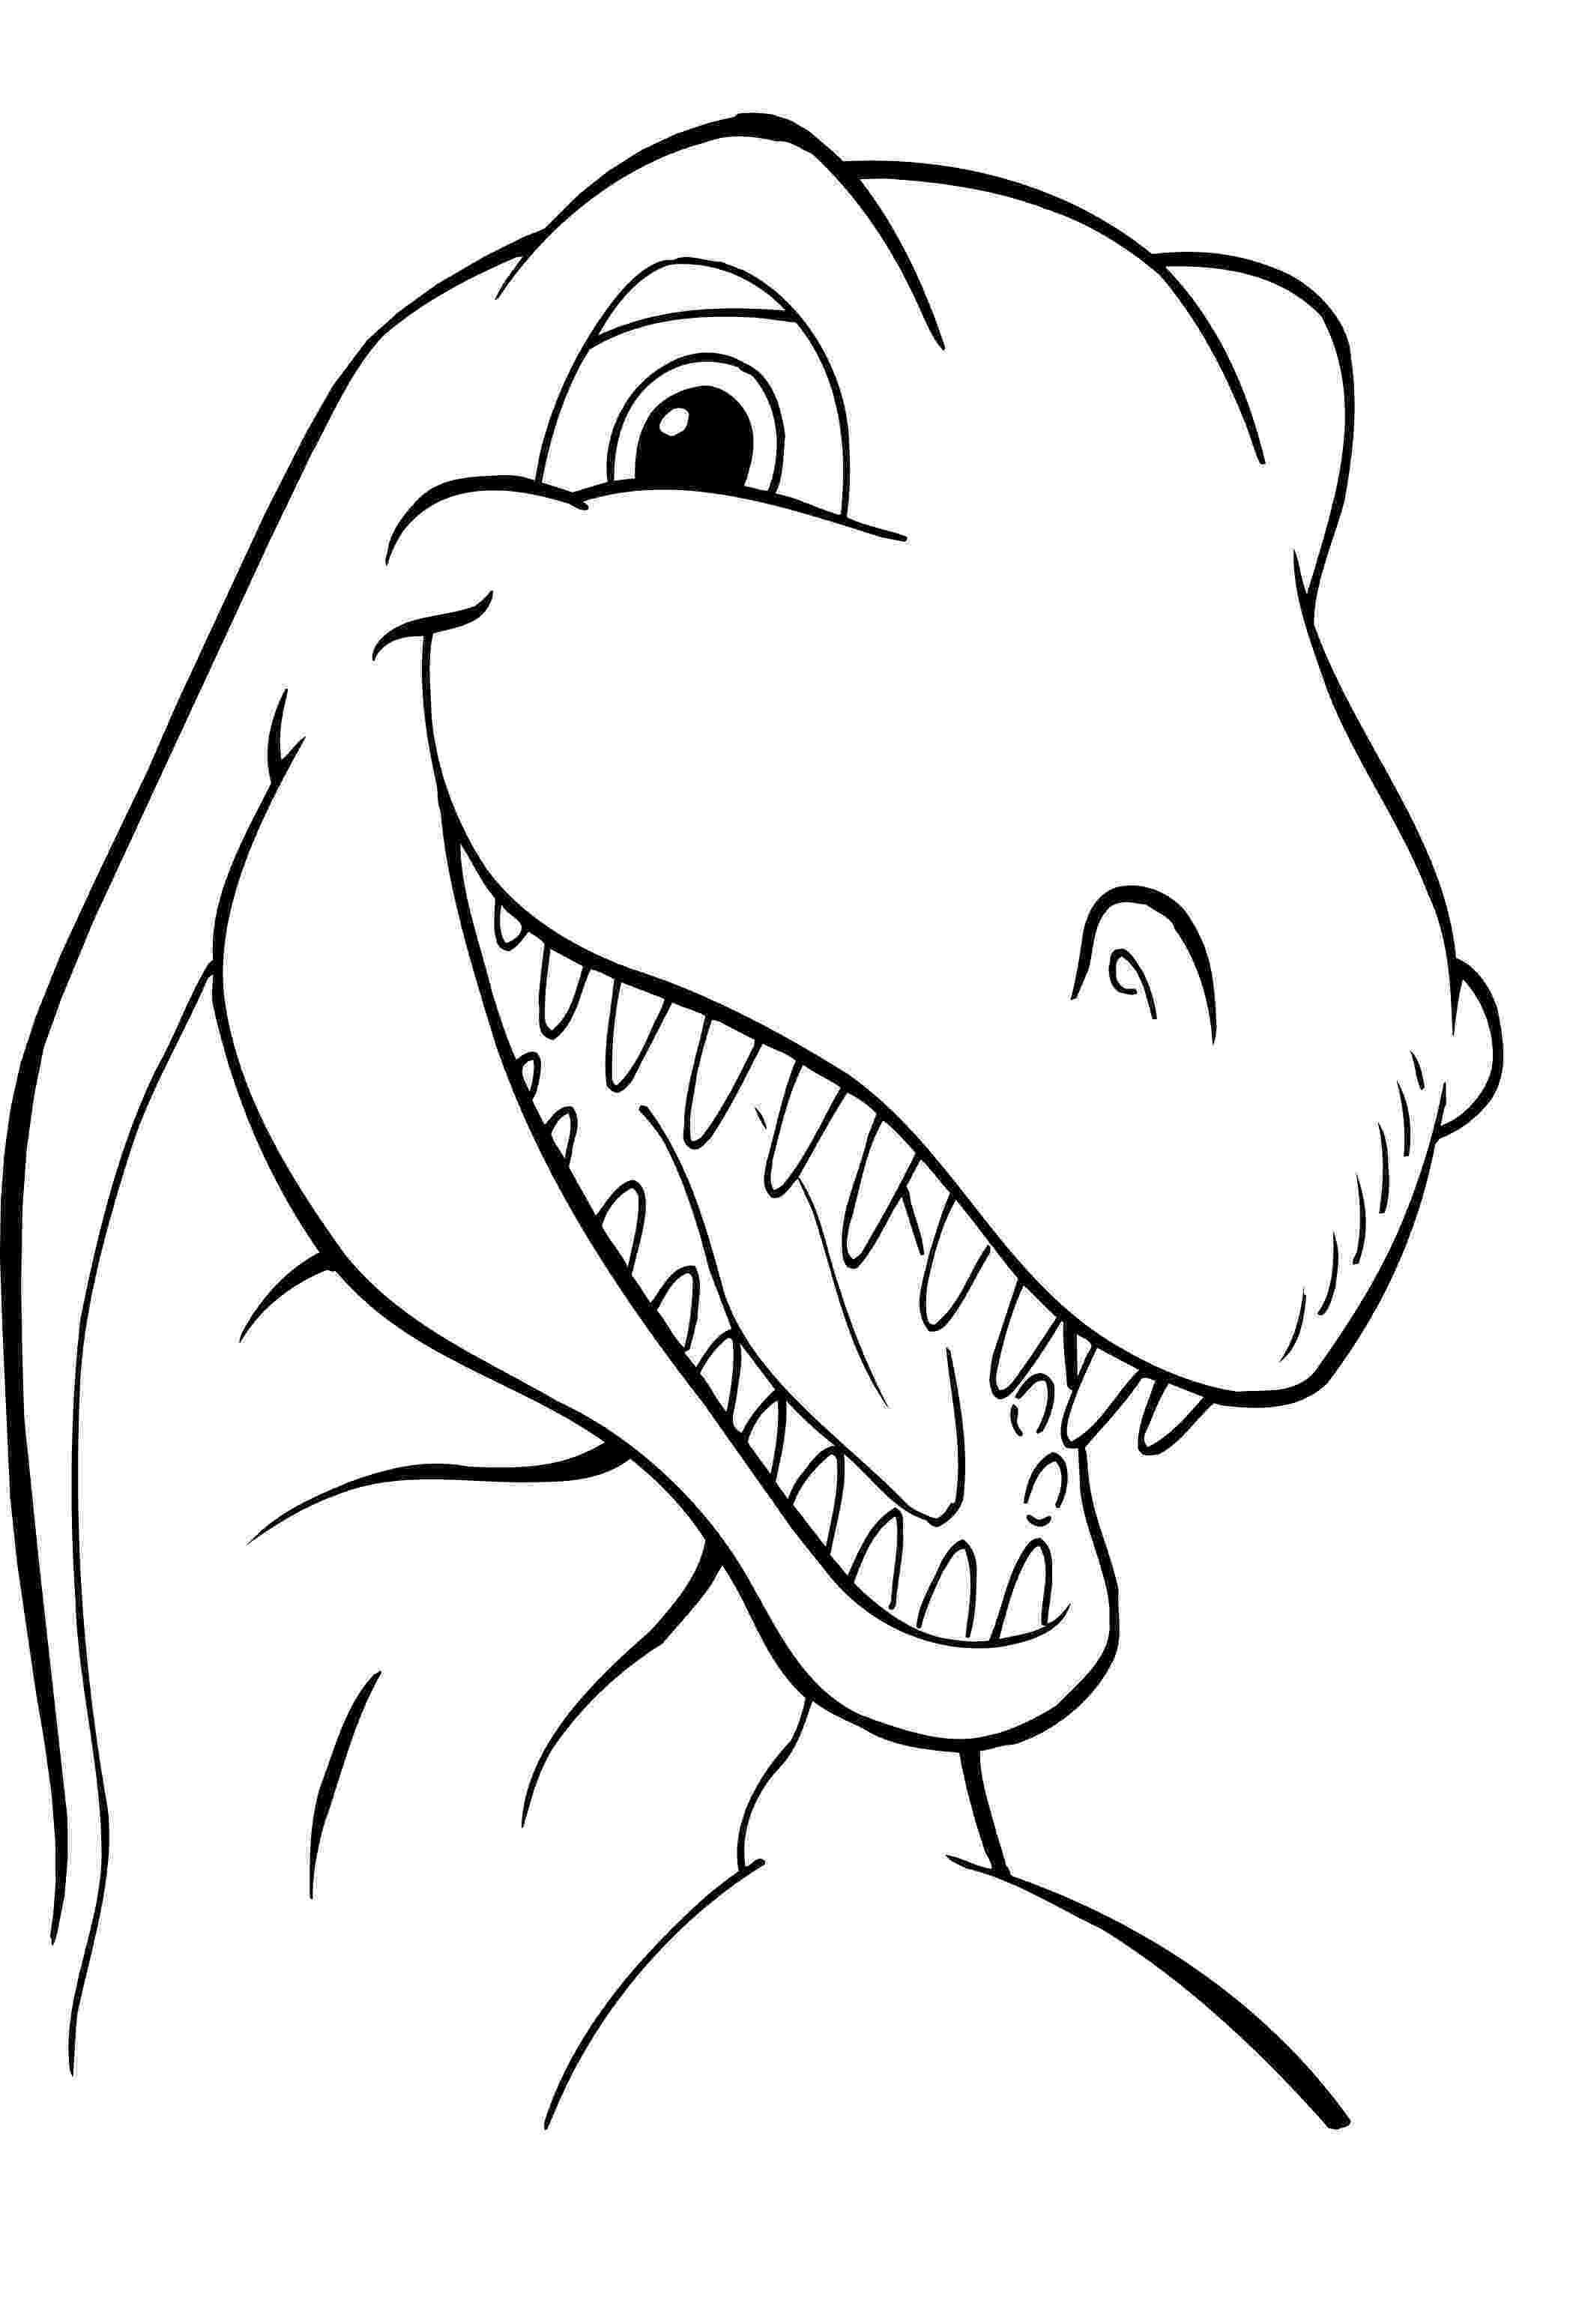 free dinosaur printables free printable dinosaur coloring pages for kids free printables dinosaur